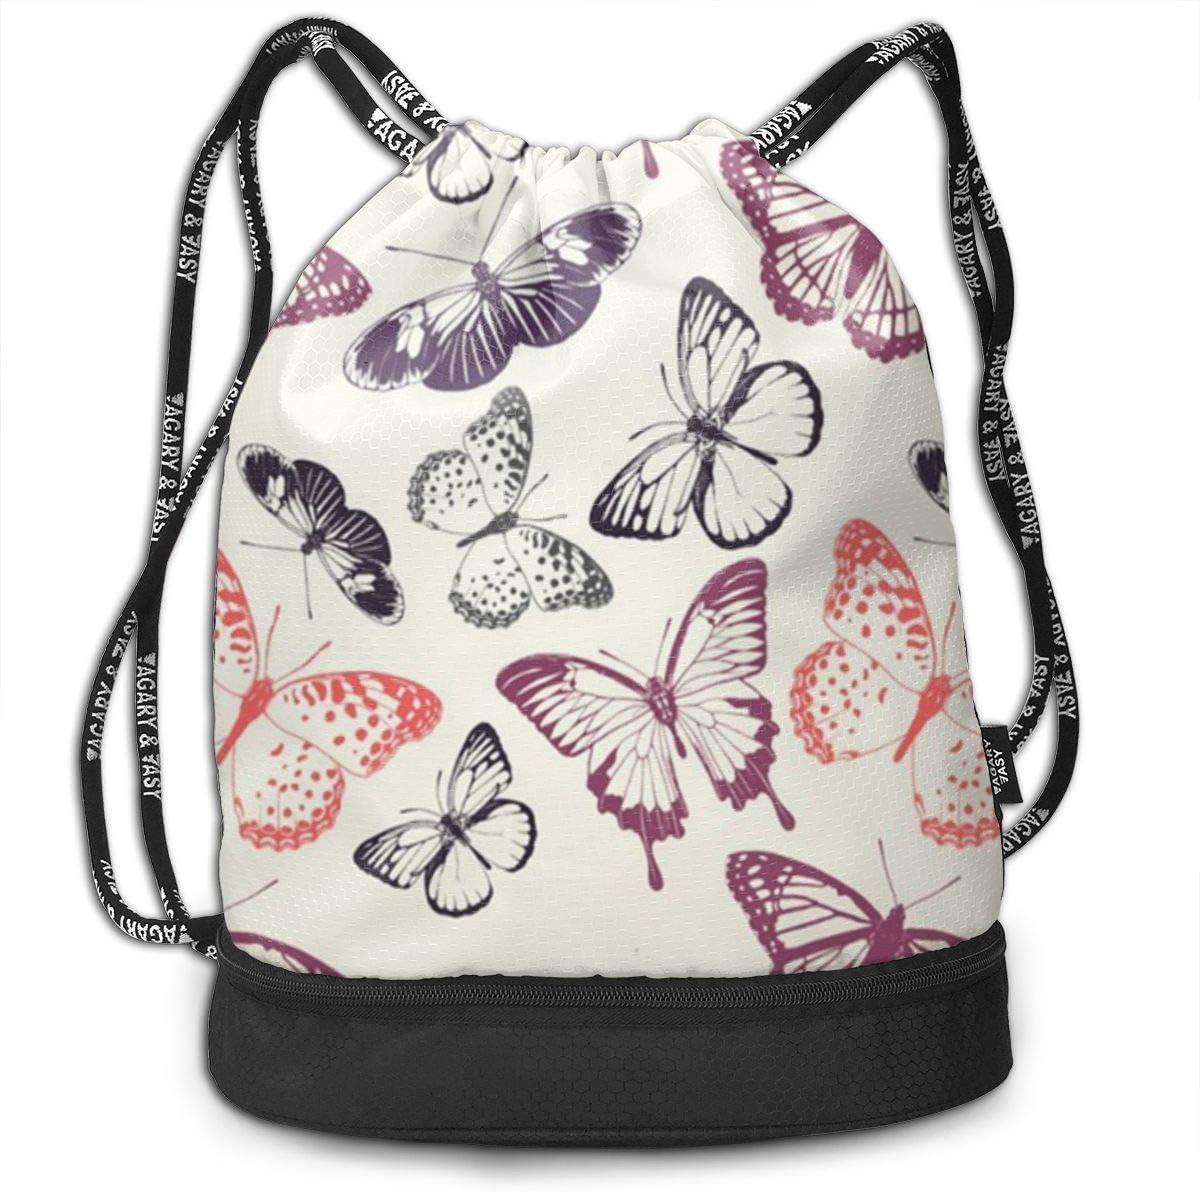 Butterflies Multifunctional Bundle Backpack Shoulder Bag For Men And Women